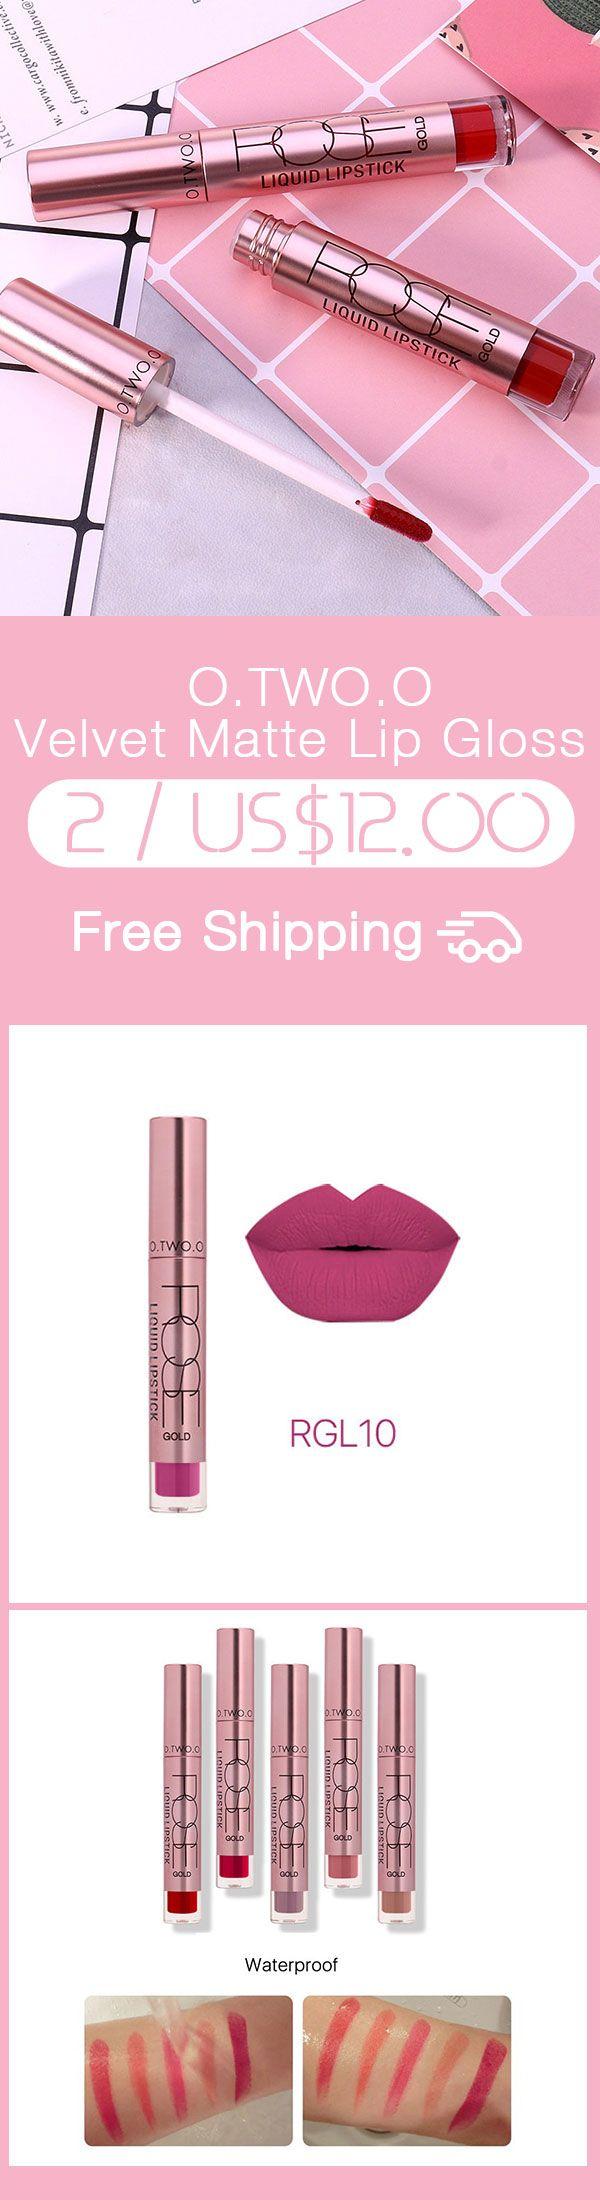 O.TWO.O Velvet Matte Lip Gloss Long Lasting Lips Makeup Waterproof Lipstick Liquid 12 Colors